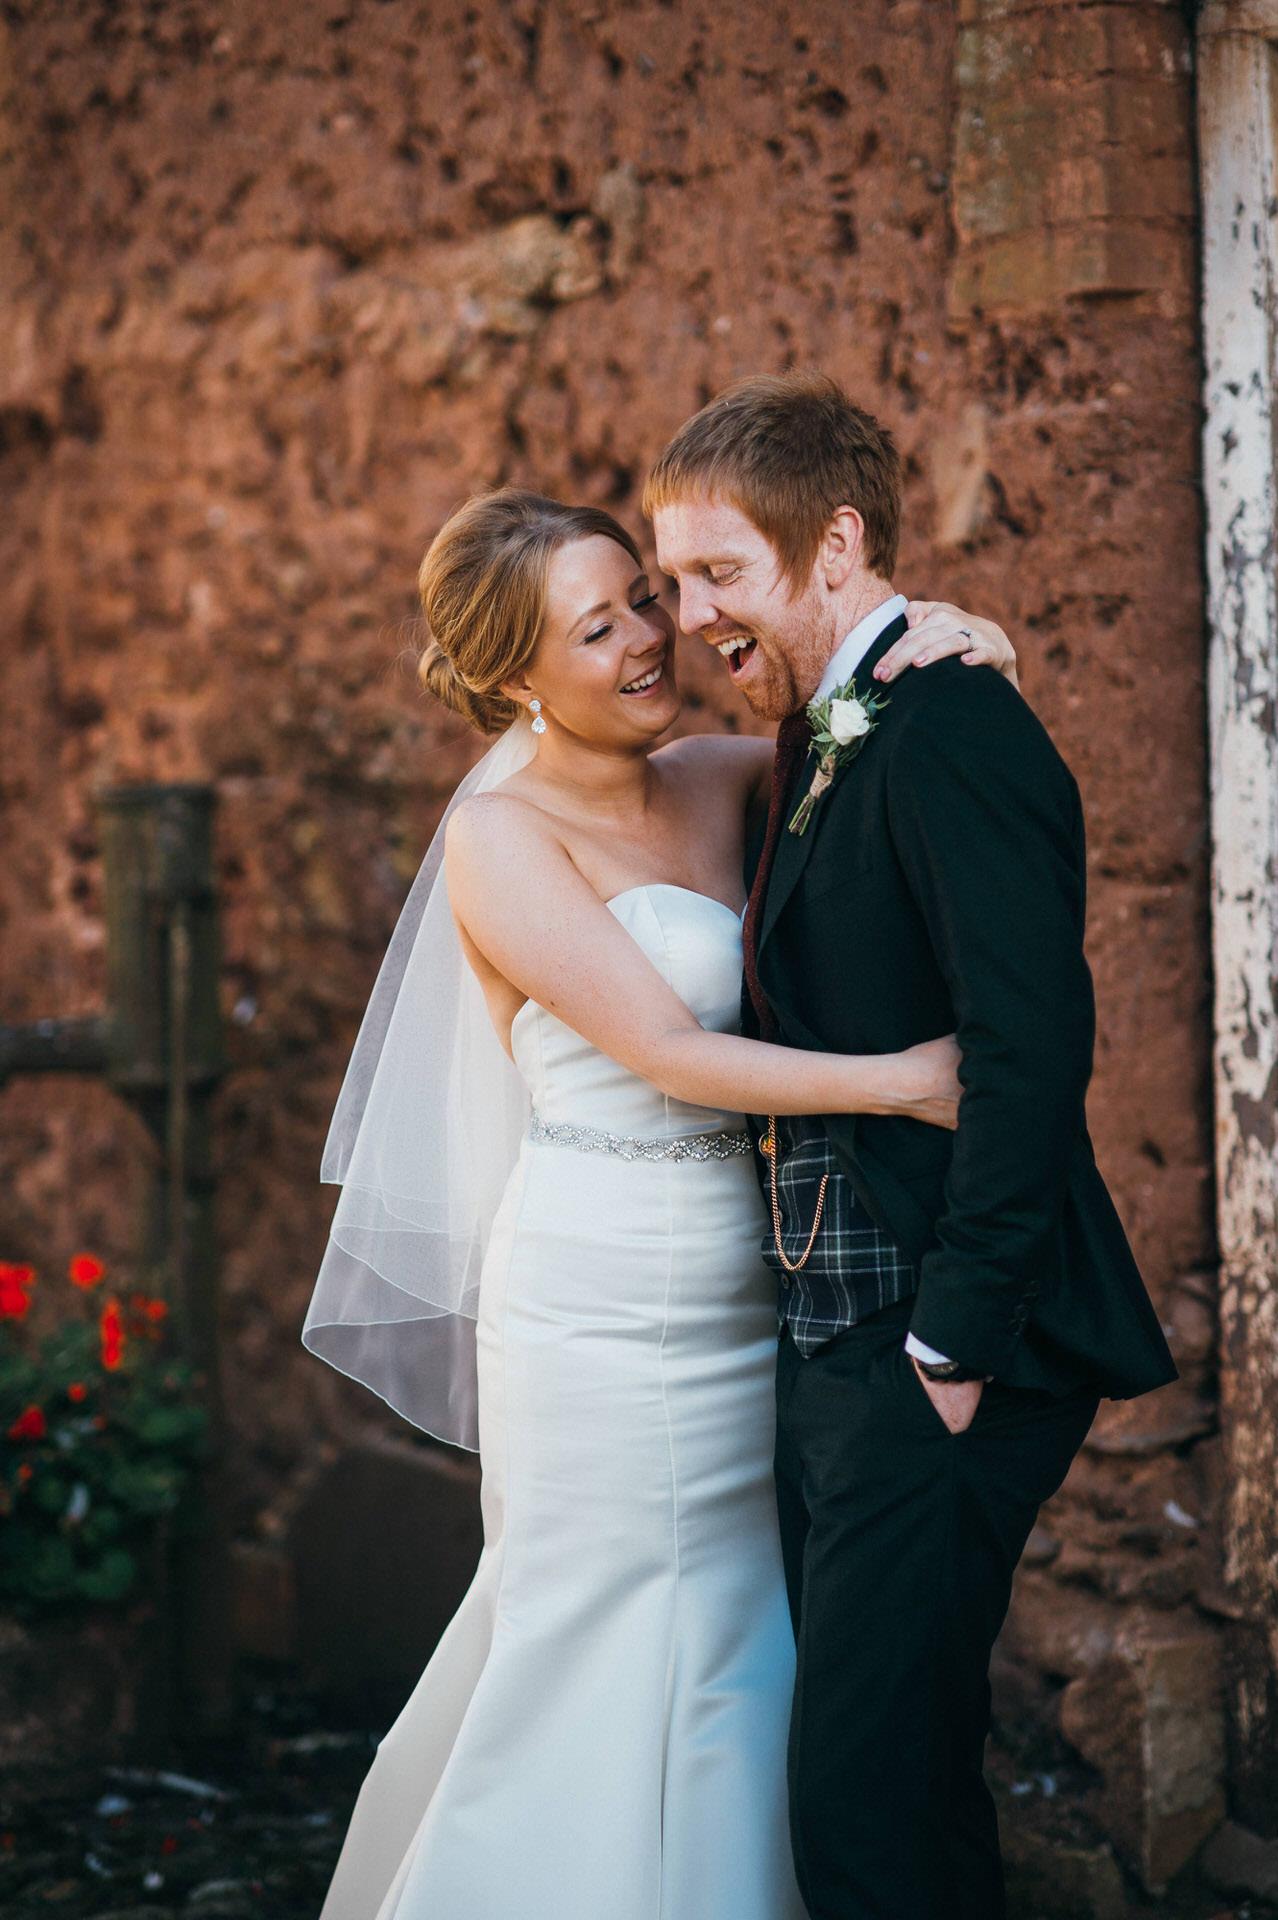 Maunsel house wedding photography 35 wedding portrait